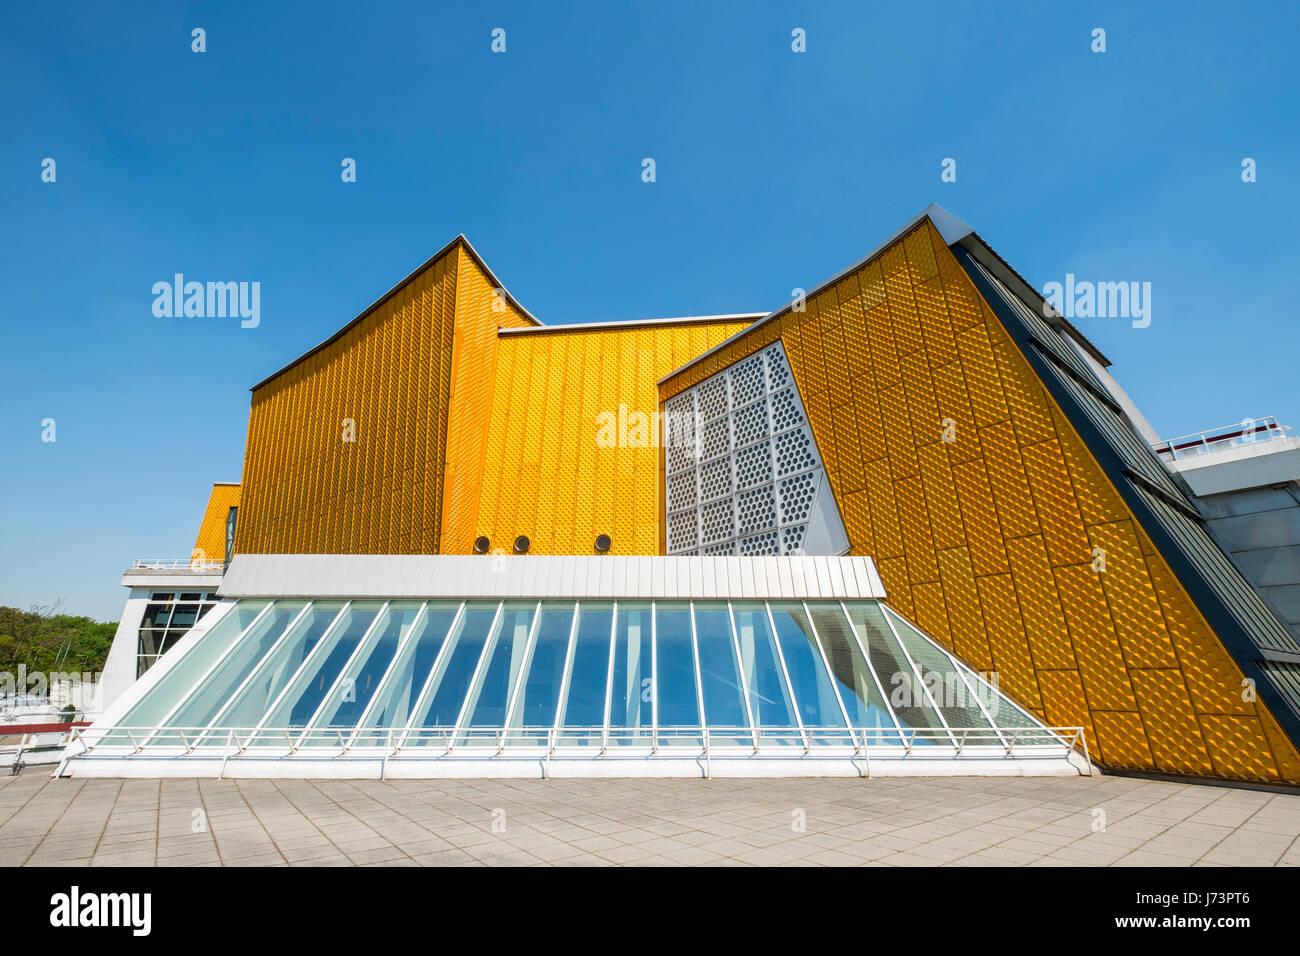 Vue Exterieure De La Salle De Concert Philharmonie De Berlin La